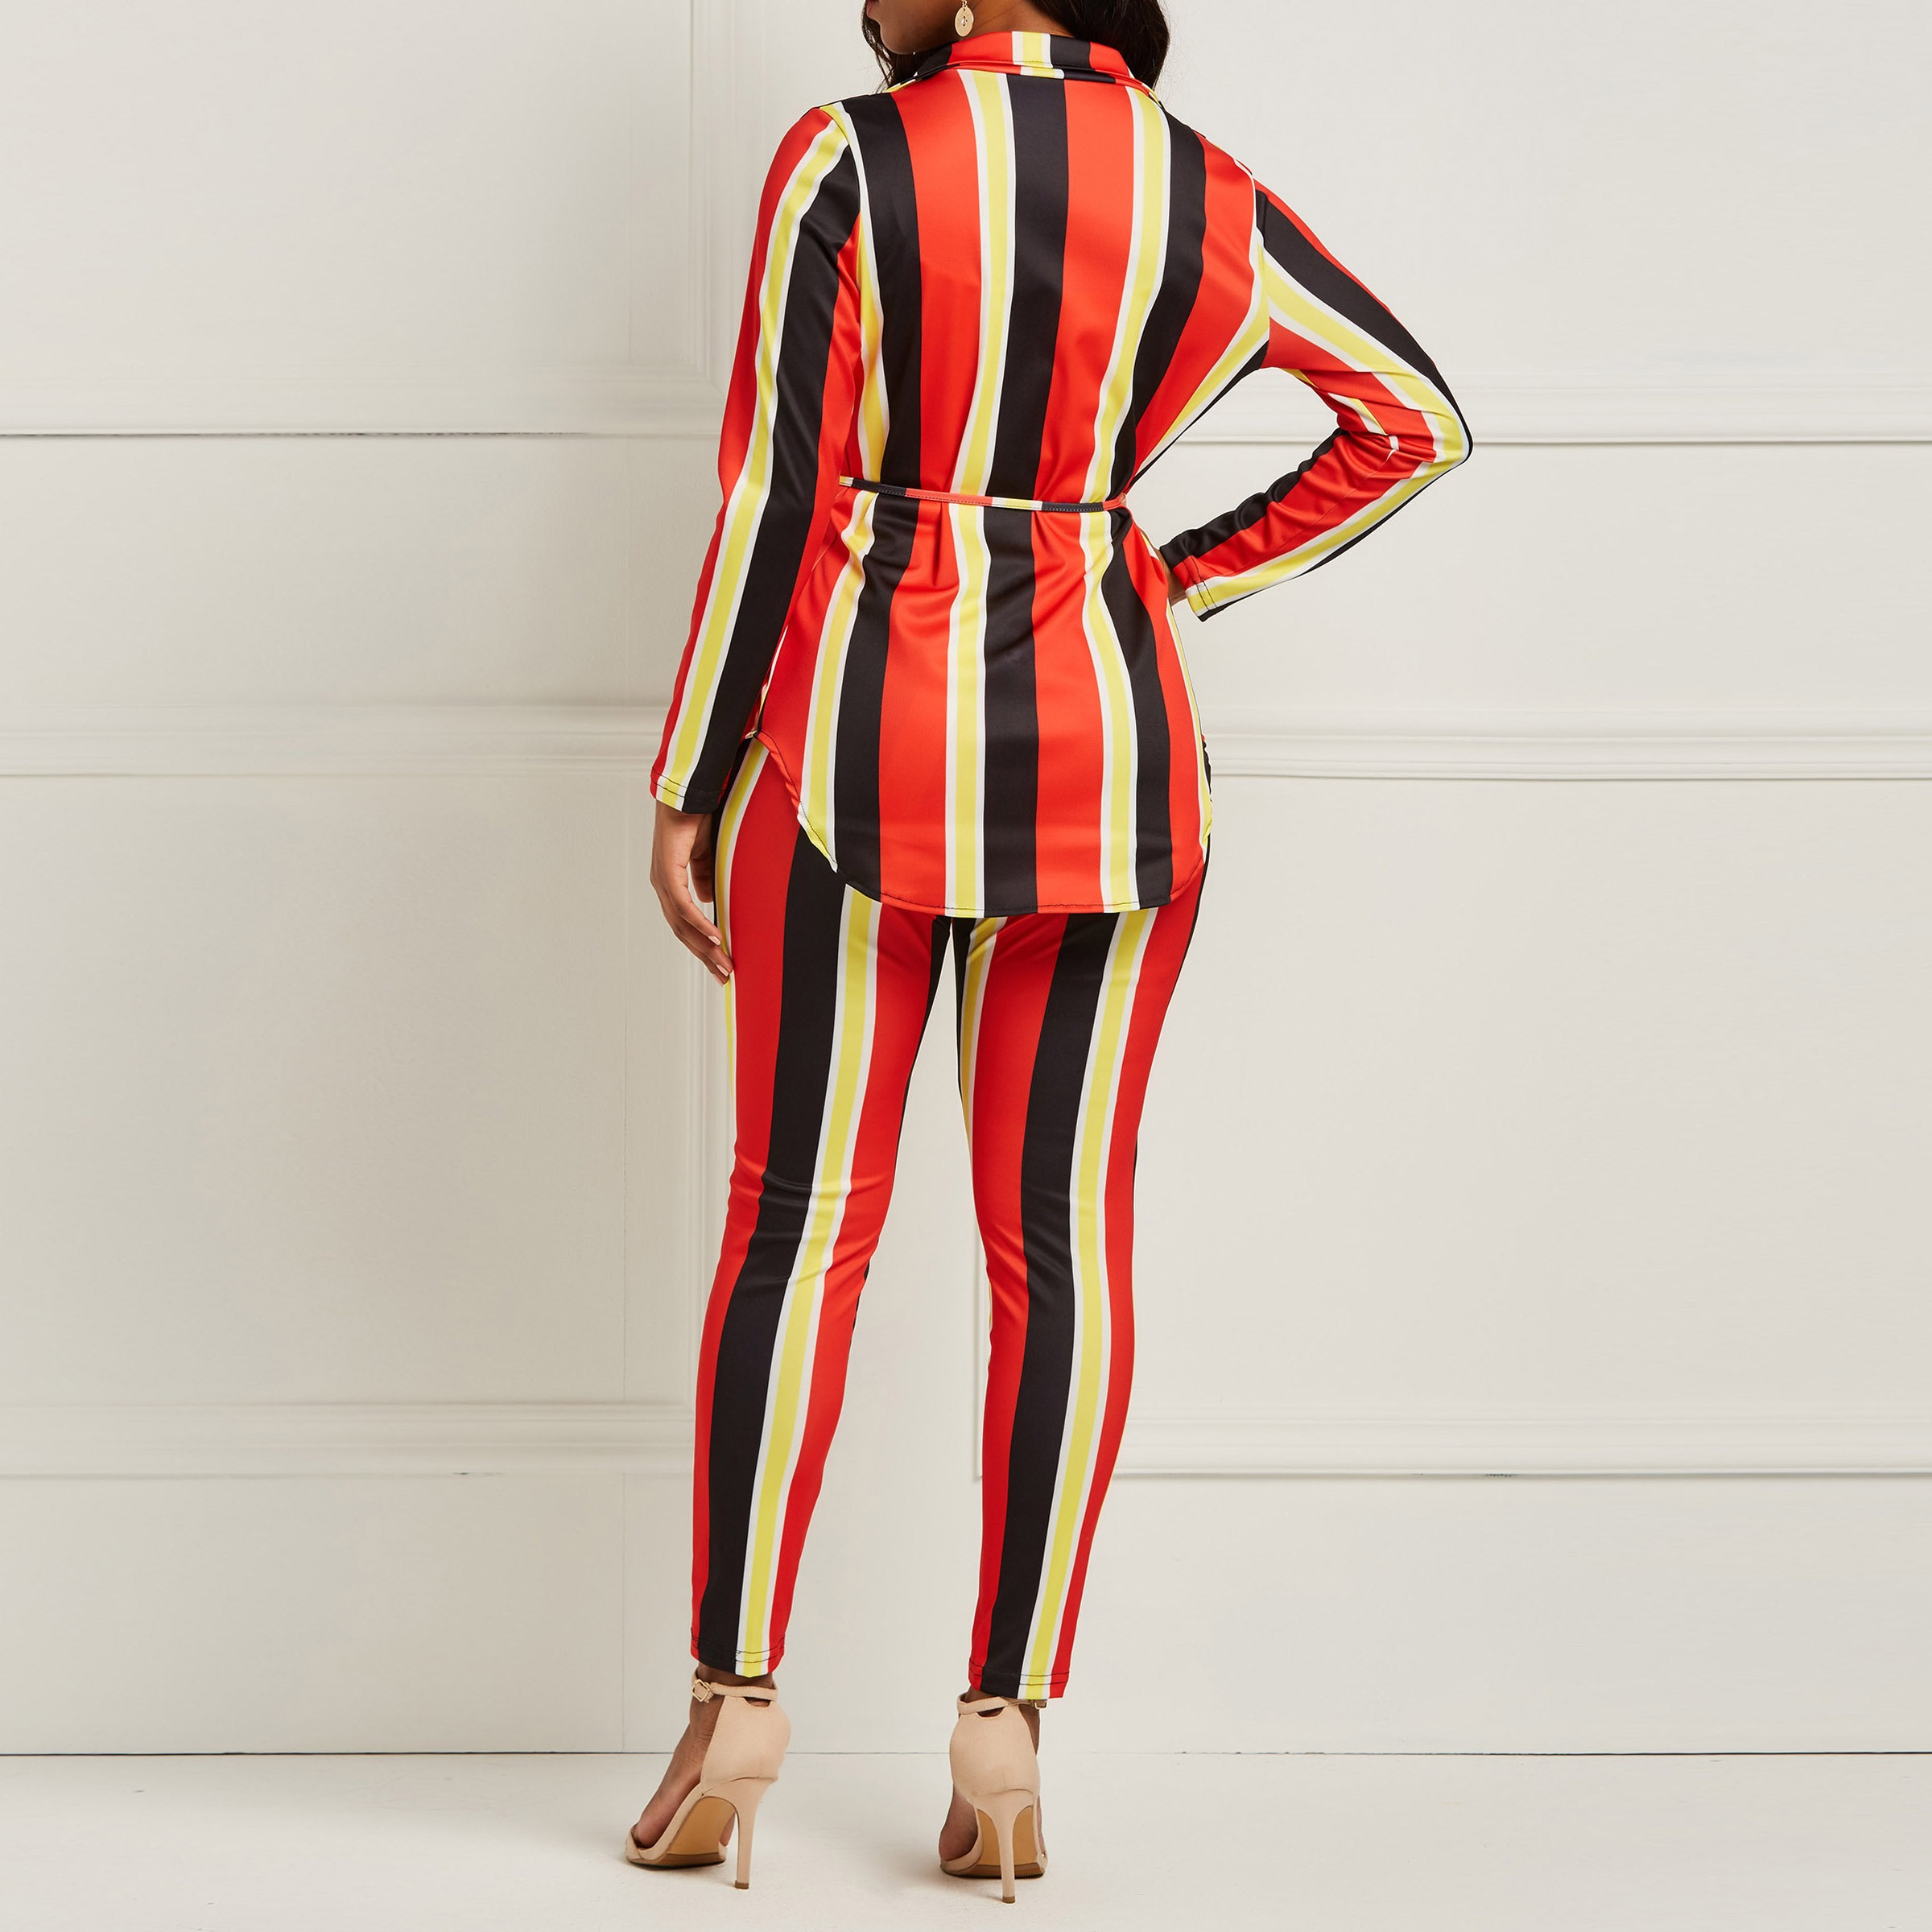 Señora Del Manga Camisa Desgaste Suit Piezas Sexy Rojo La Clocolor Rayas Dos De Oficina Femenina Mujeres Juego Set Moda Pant Larga Pantalones Superior Traje q14zSzBwxT